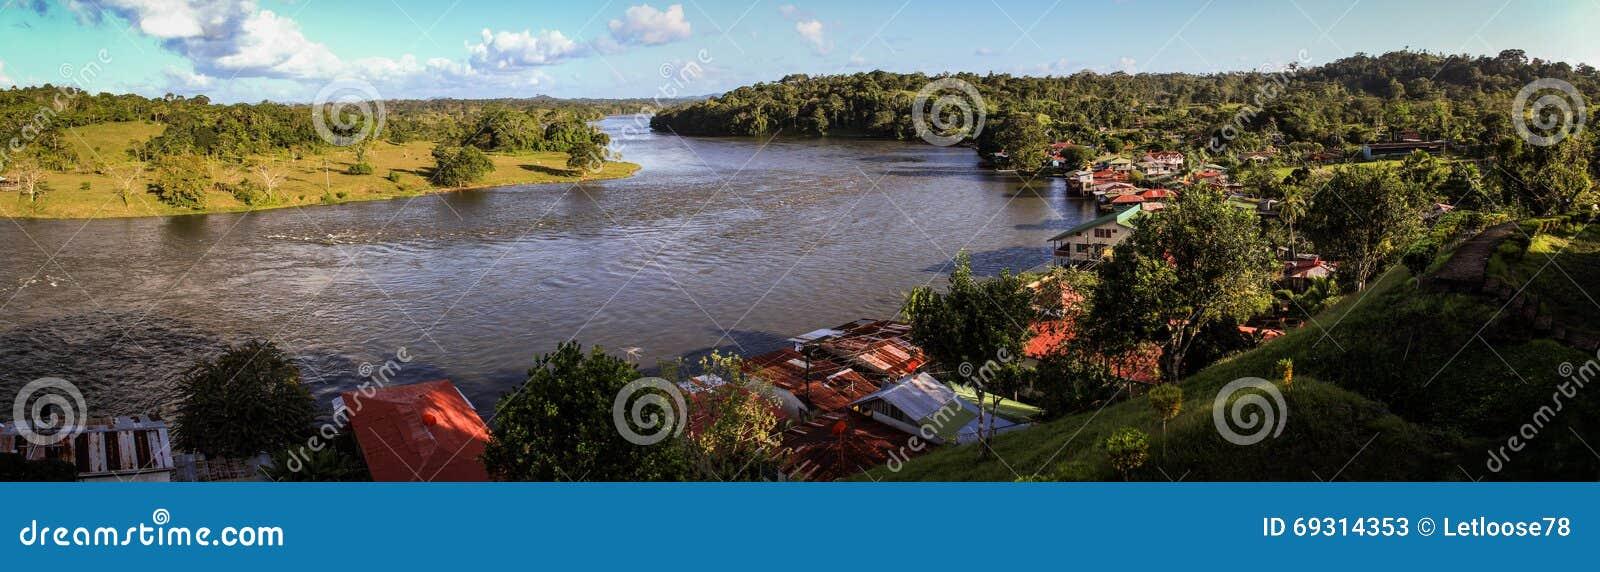 Mening van Rio San Juan, van de oude Spaanse Vesting, Dorp van El Castillo, Rio San Juan, Nicaragua